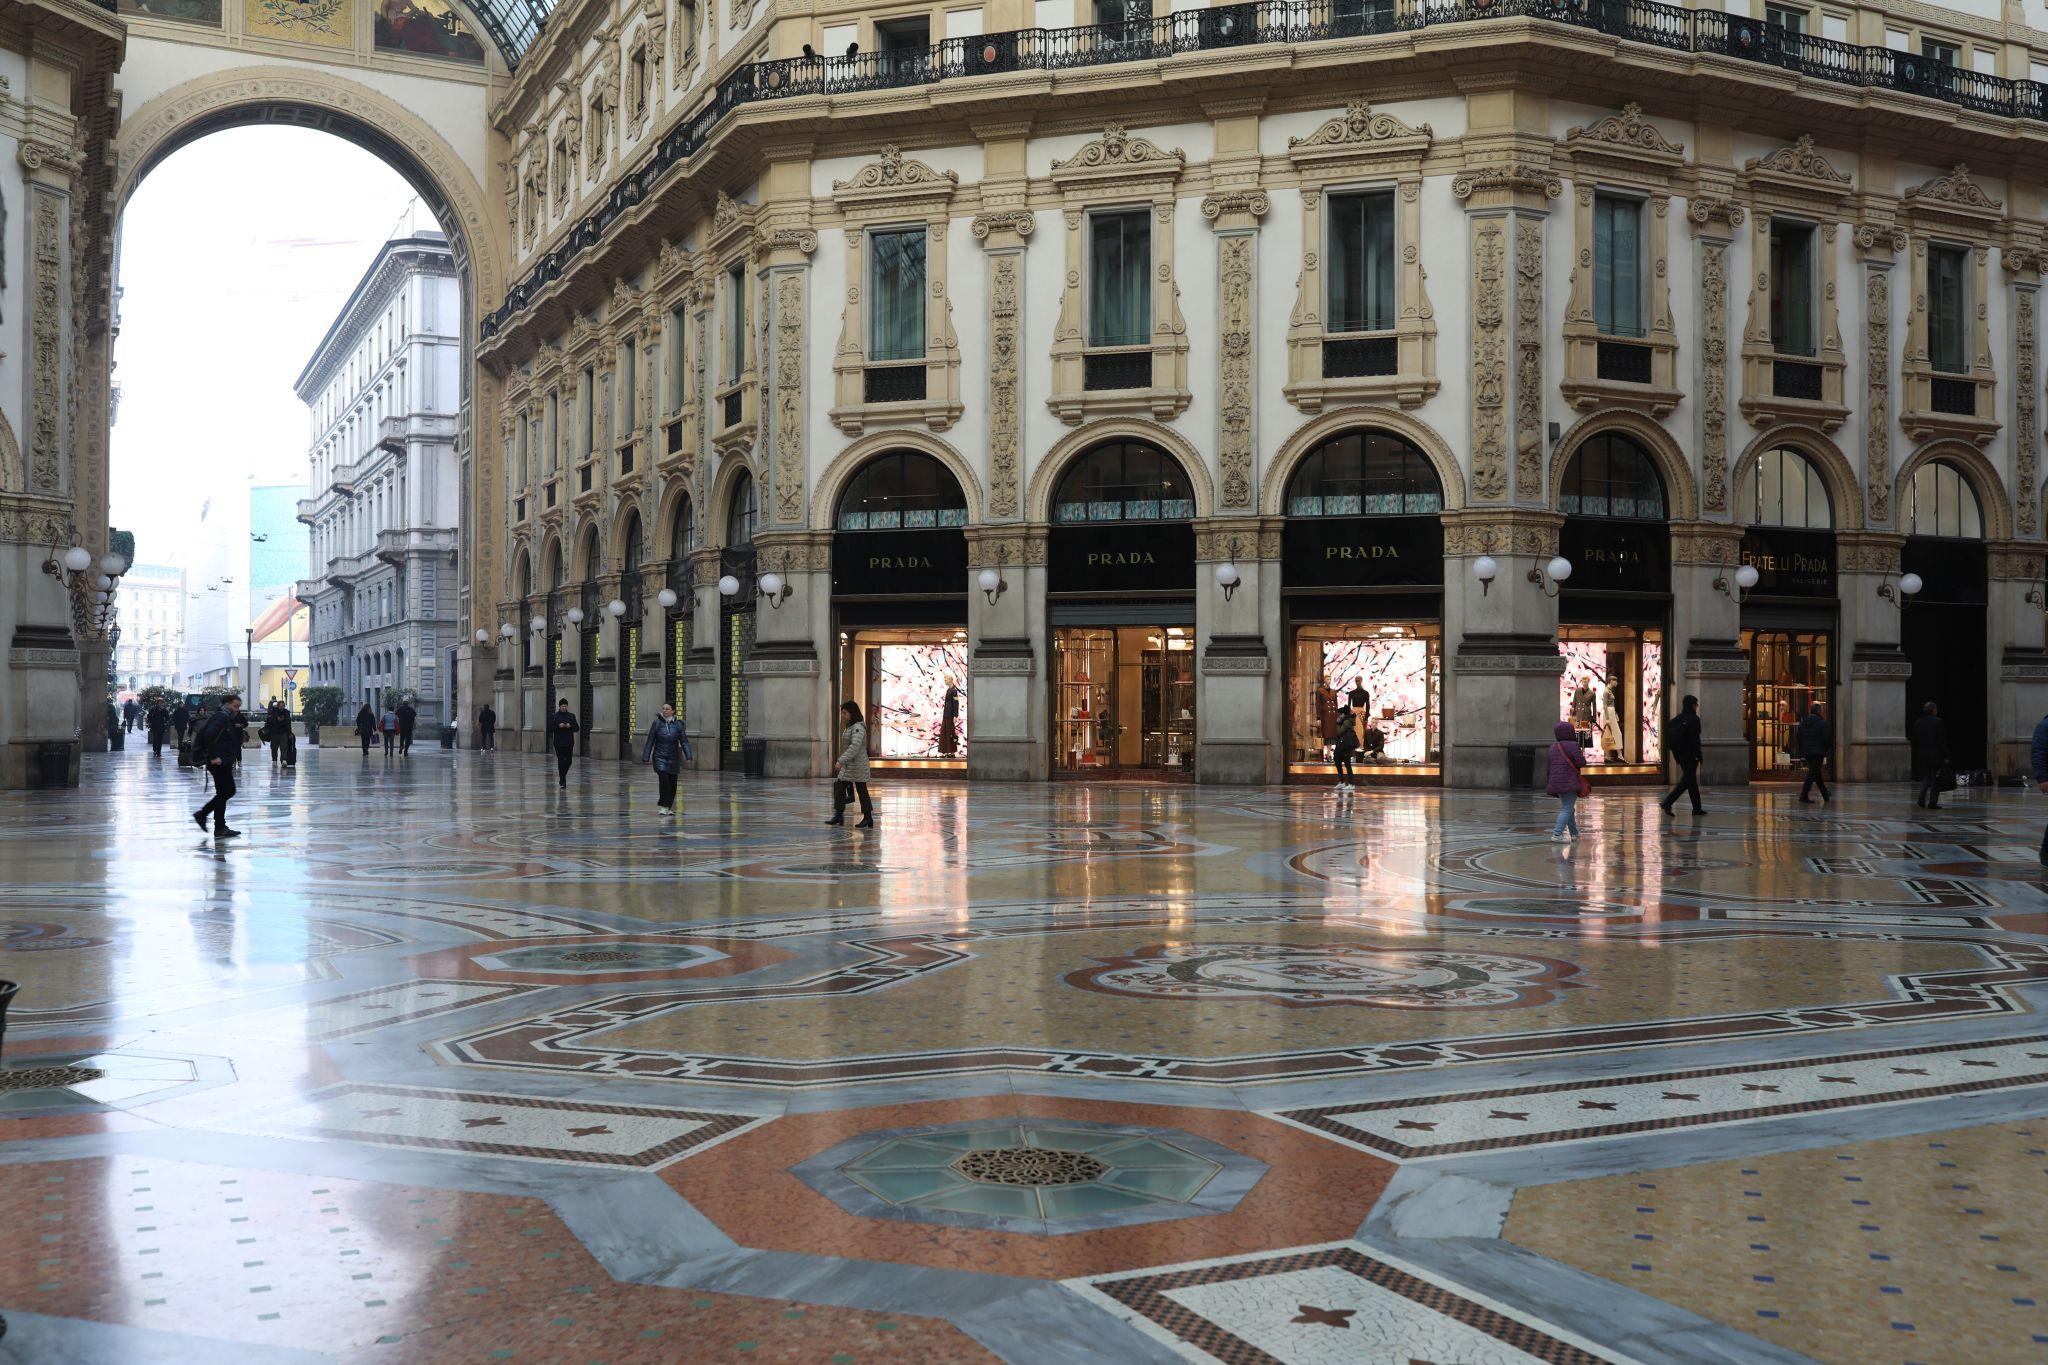 Eerie photos show empty streets in Italy amid coronavirus fears